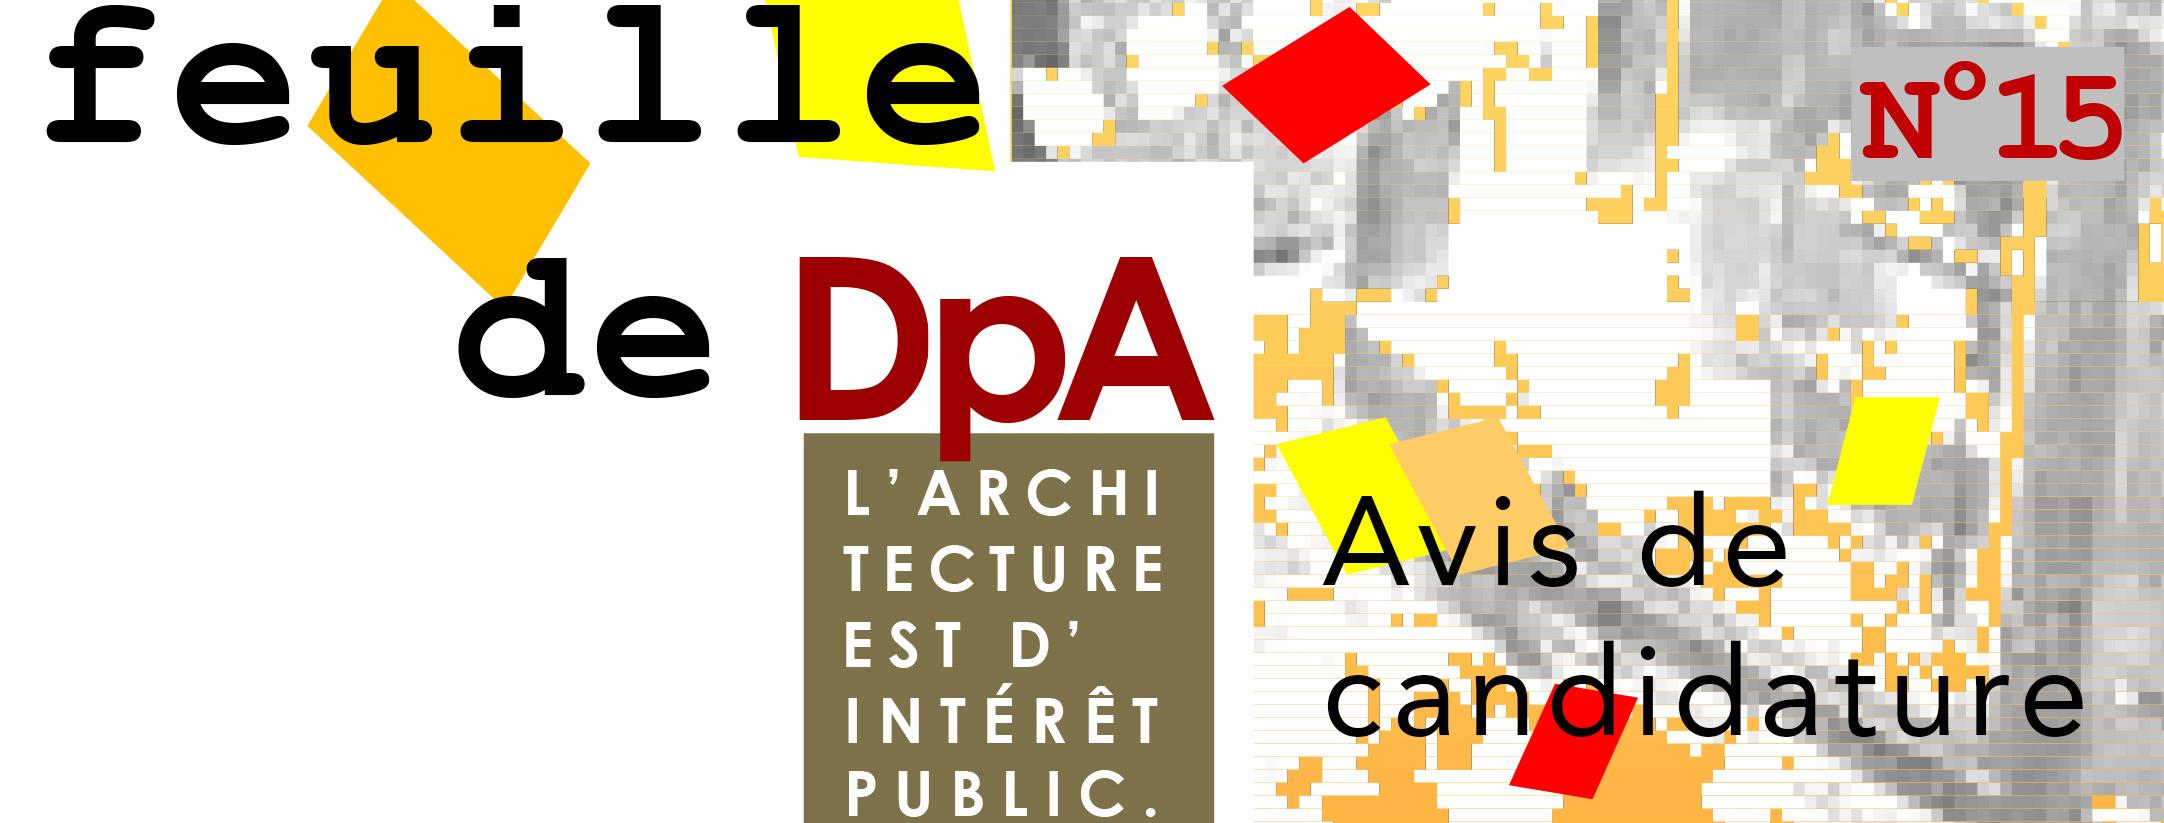 Image Bandeau - DpA - La Feuille #15